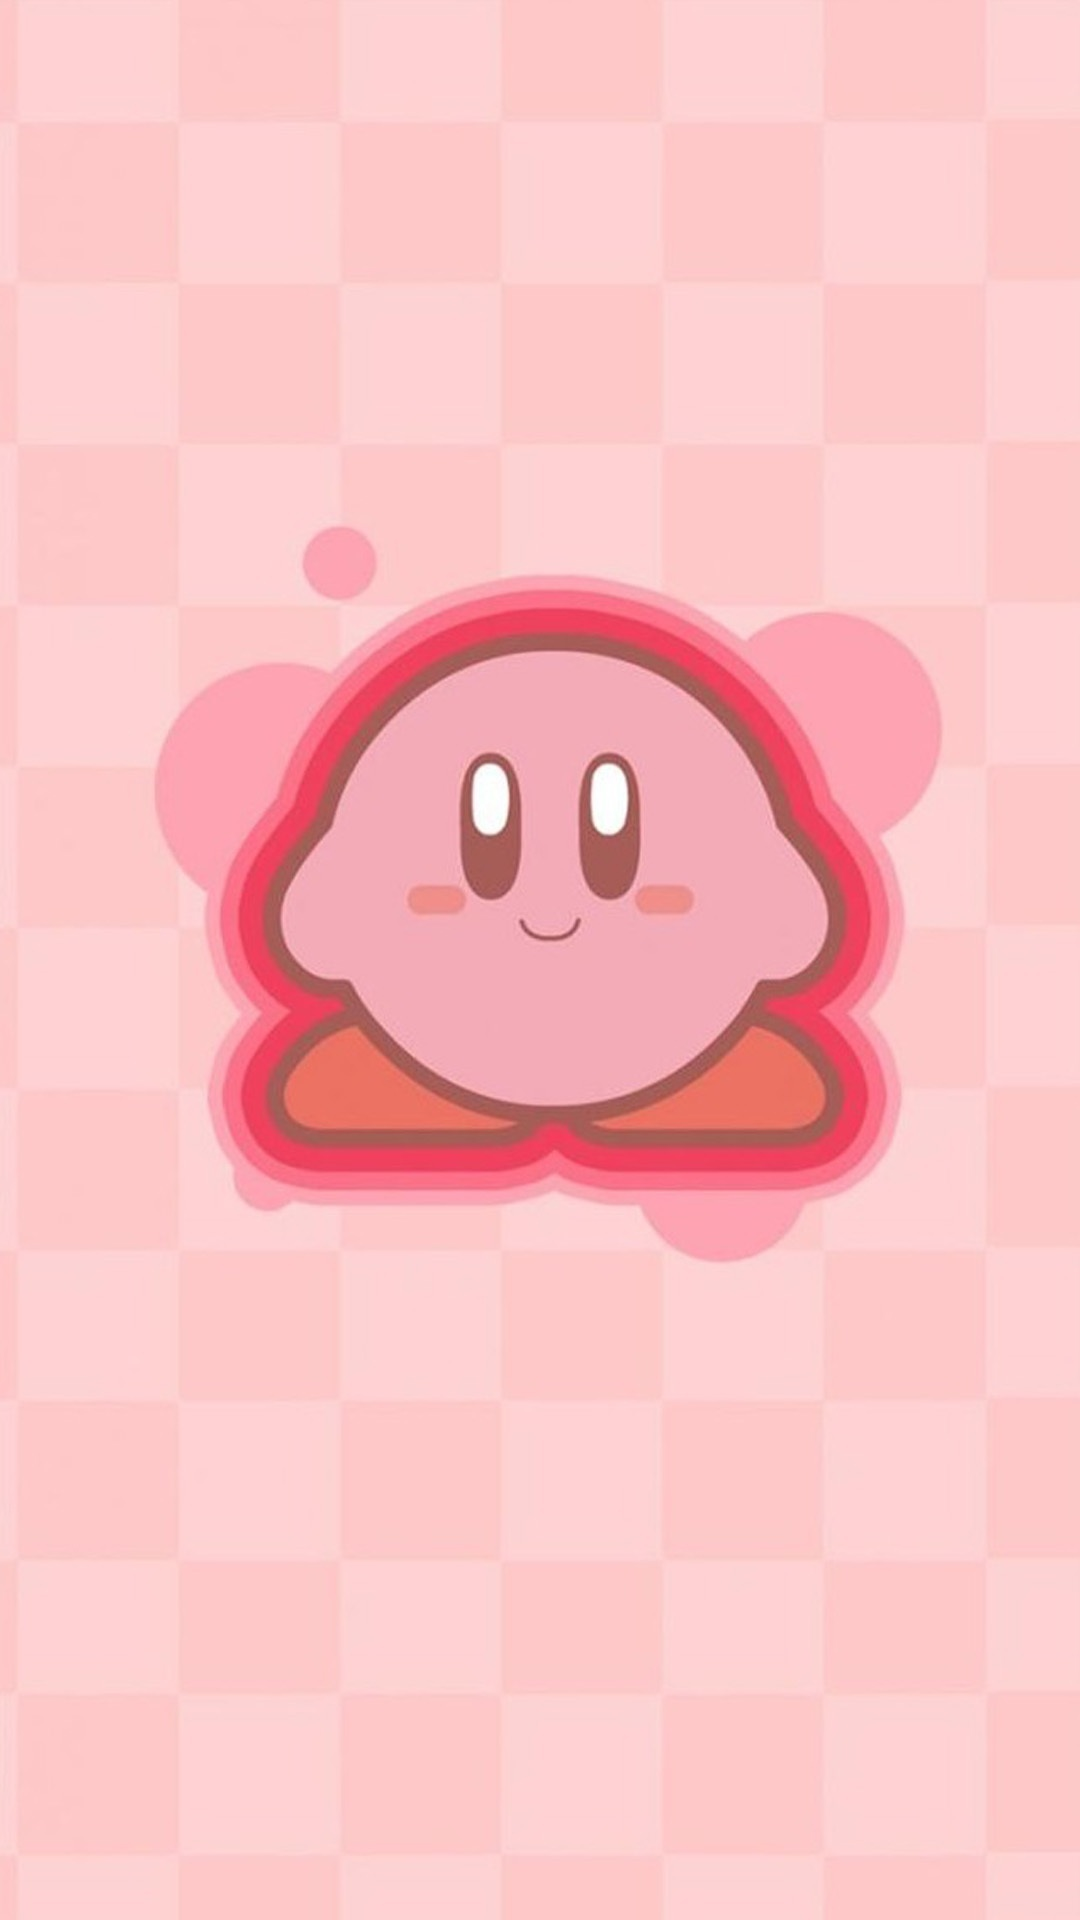 cute jelly clouds cartoon iphone wallpaper